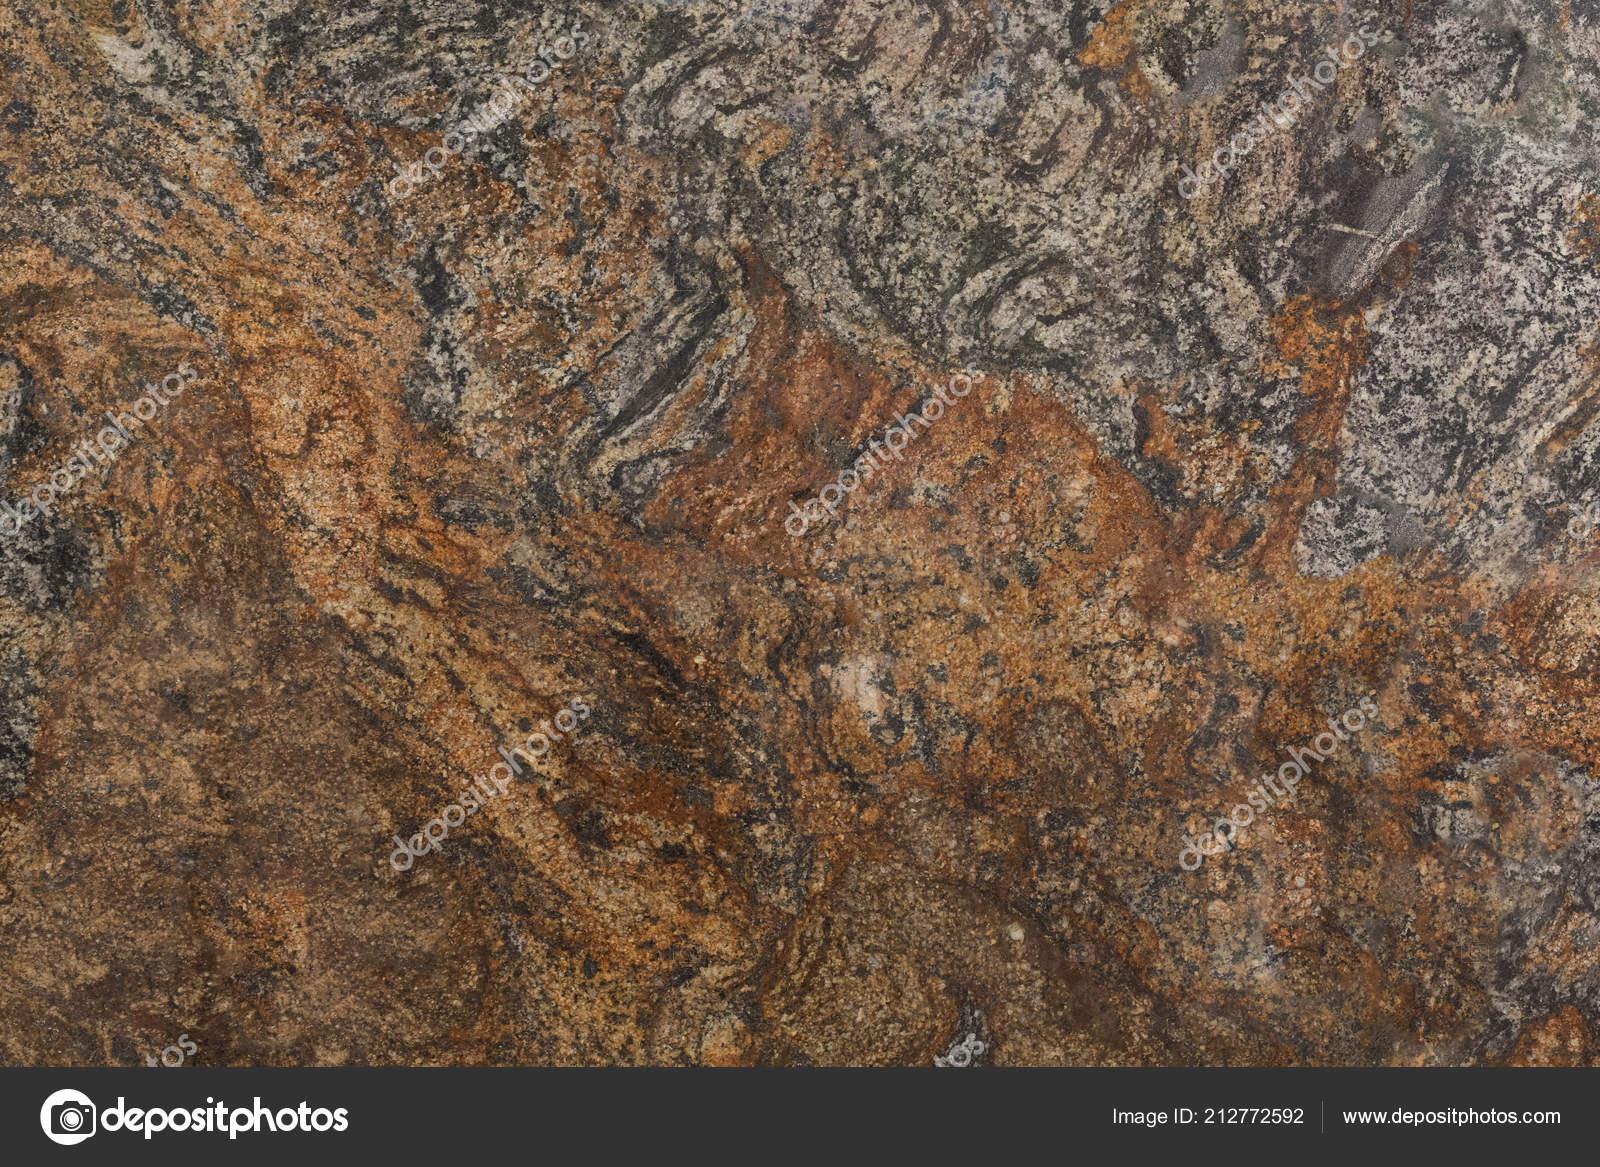 Effective Granite Texture Stylish Dark Tone High Resolution Photo Stock